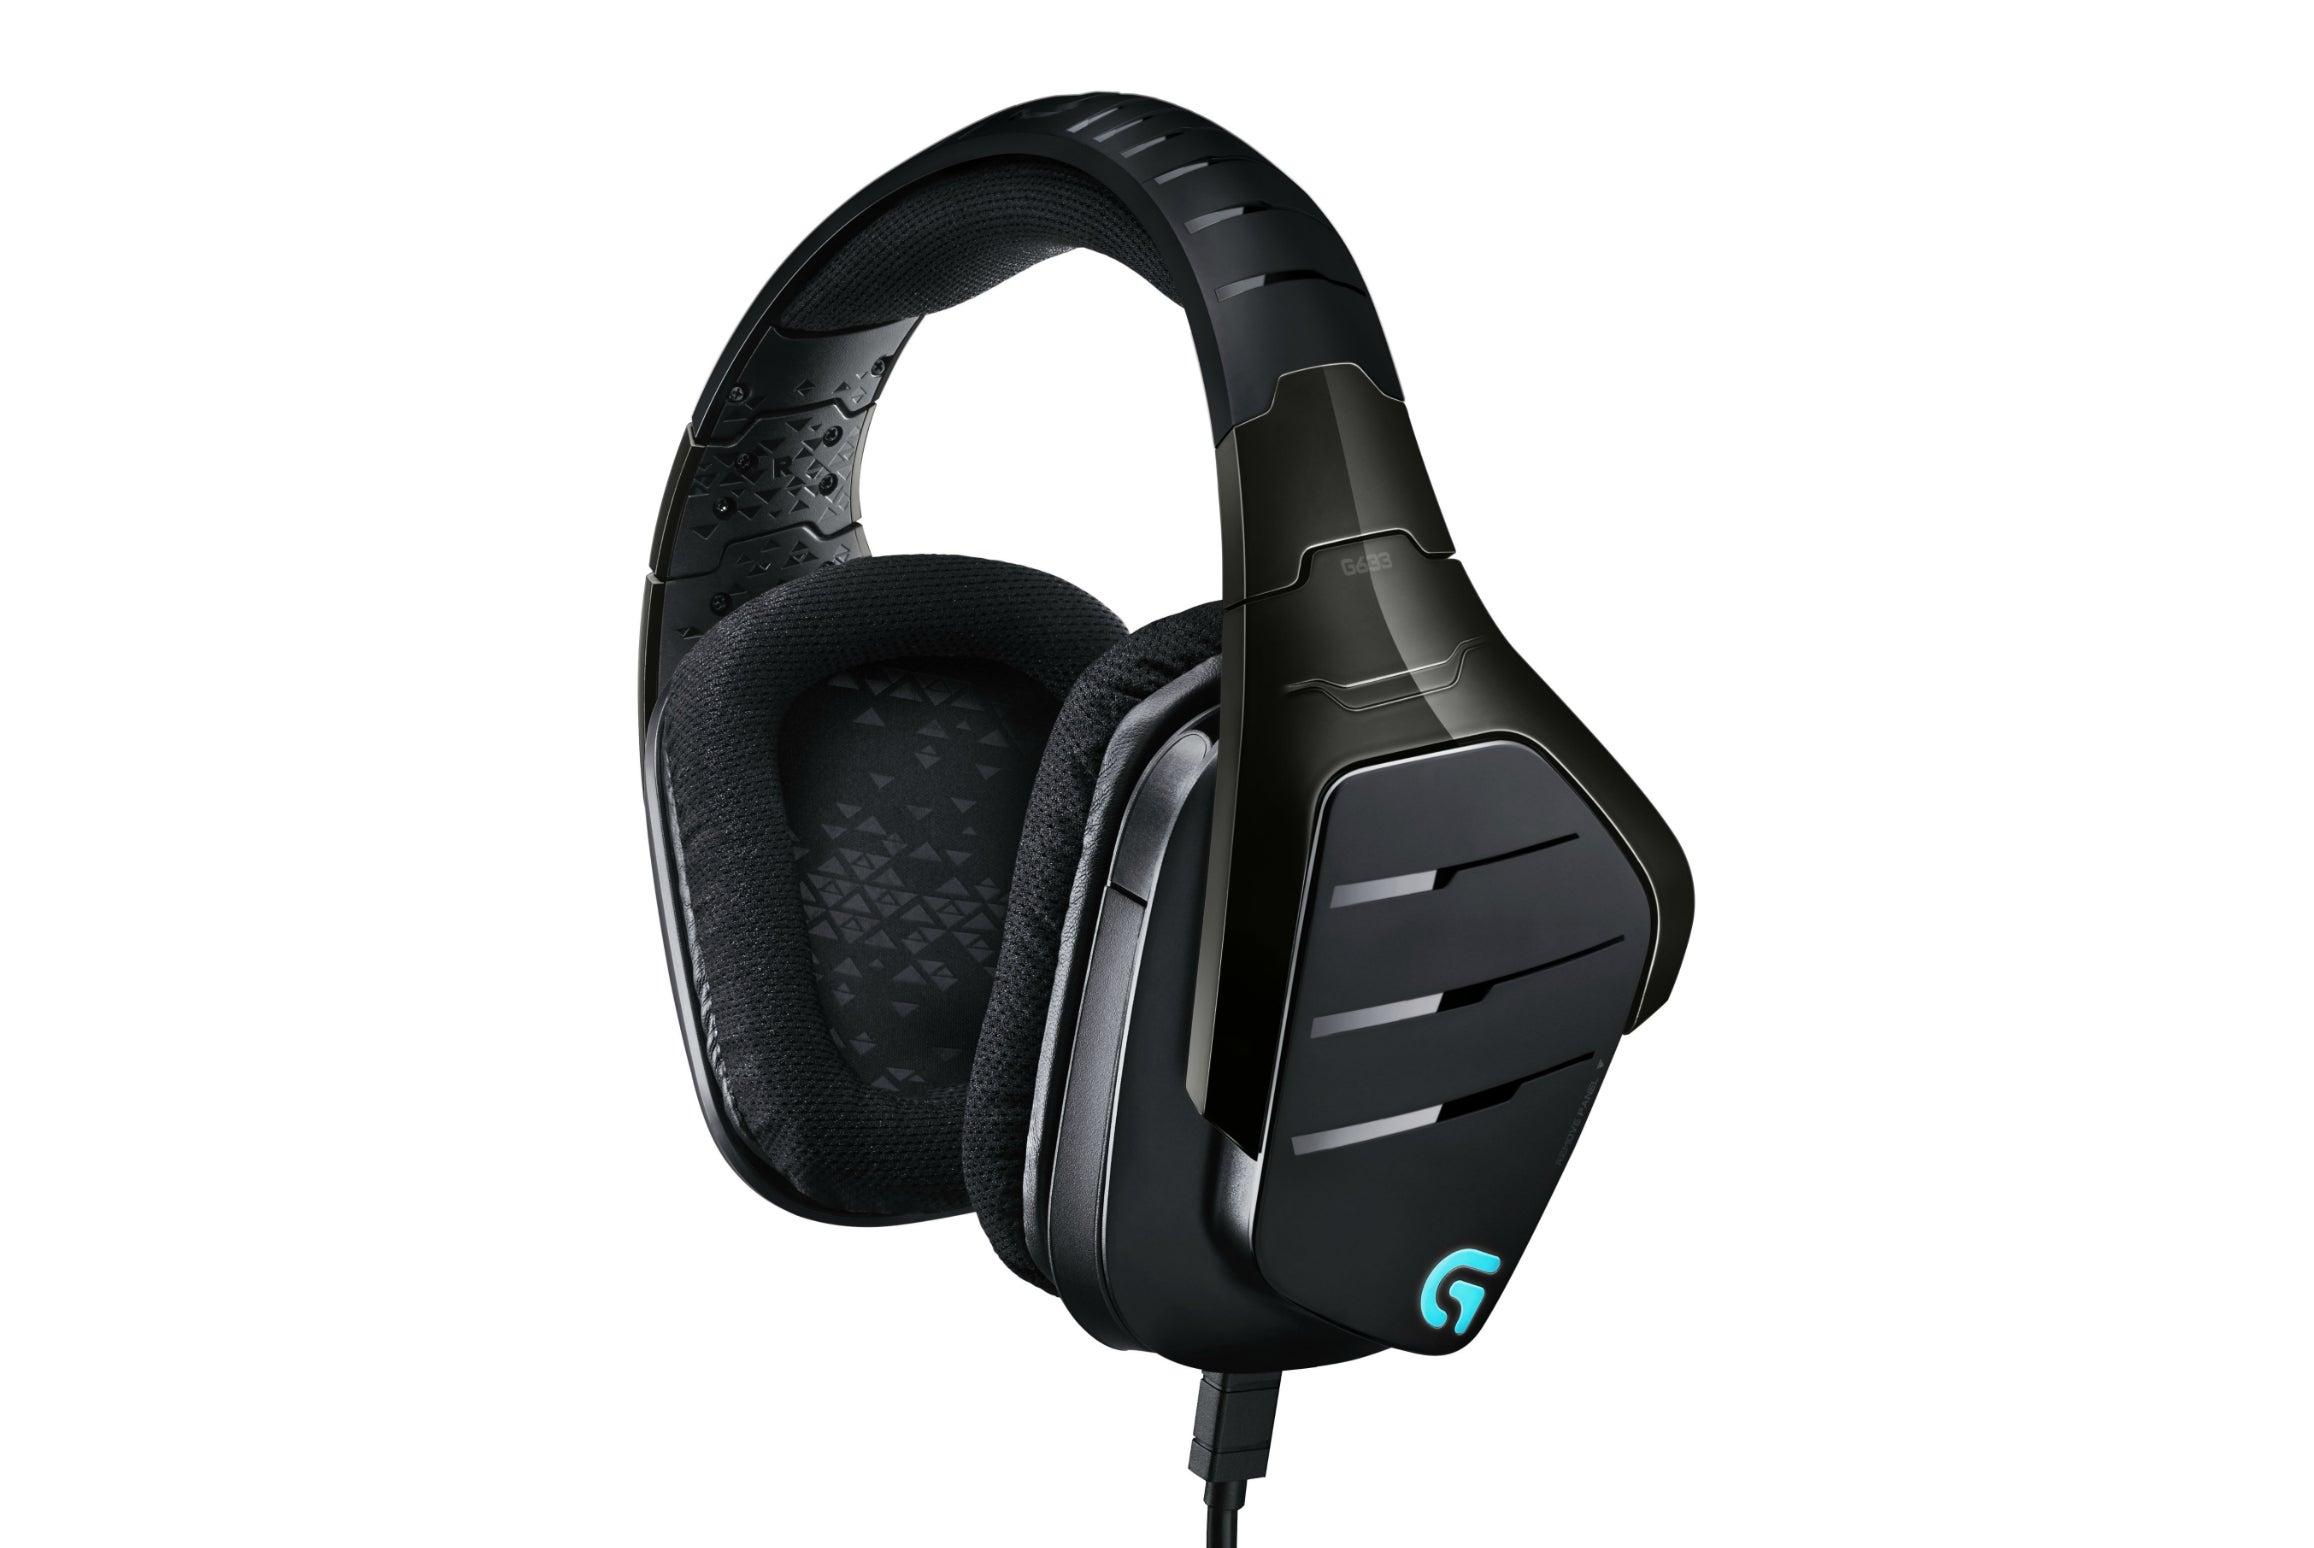 Logitech\'s gaming headsets rock 16.8m color LEDs, surround sound ...